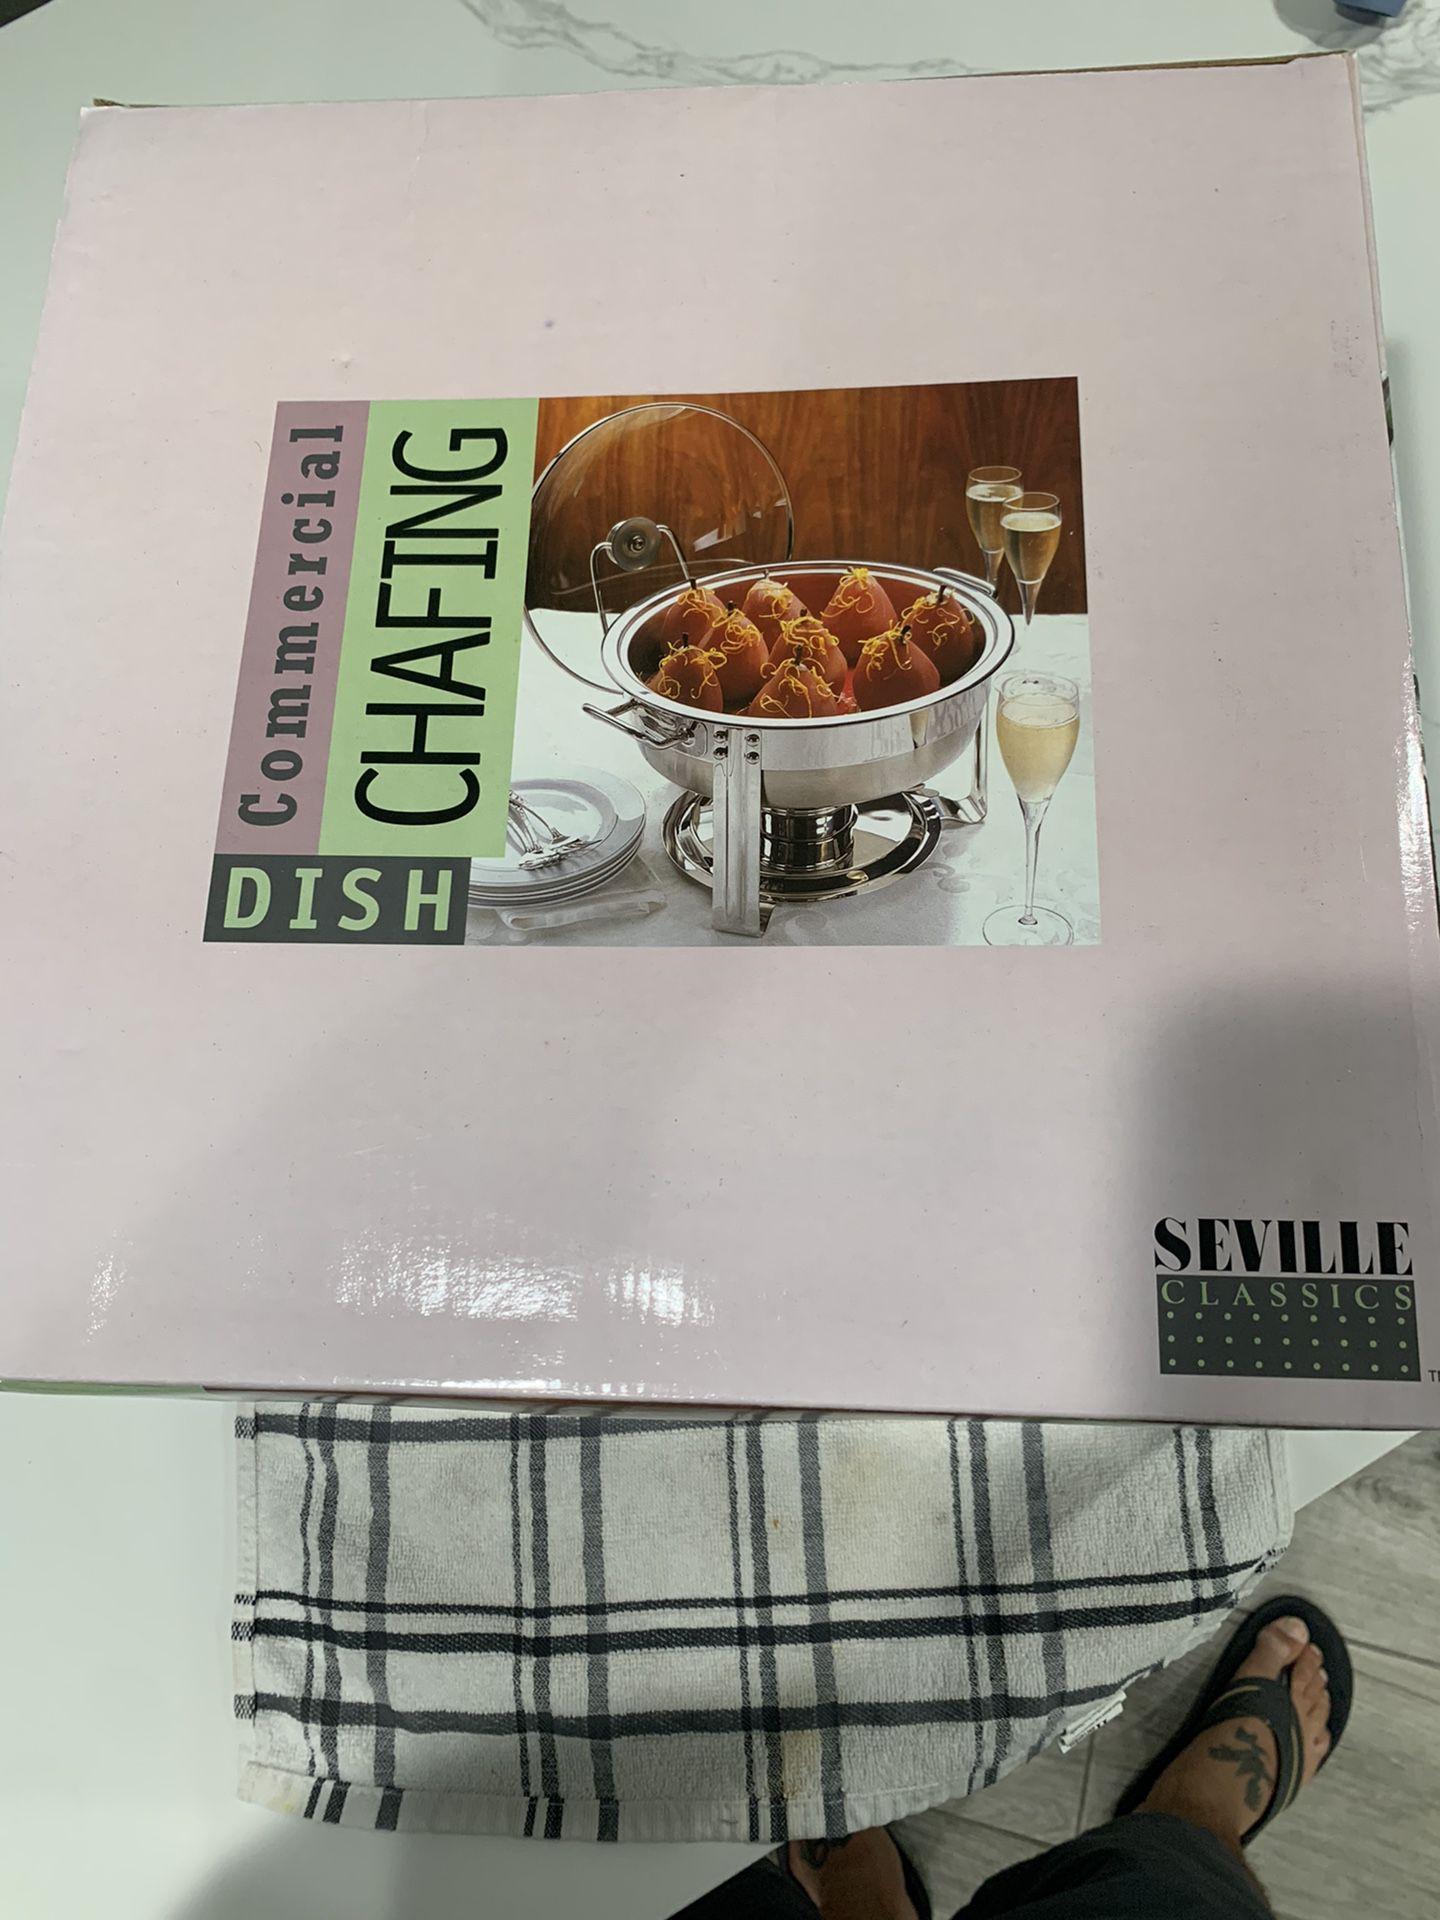 Chafing dish